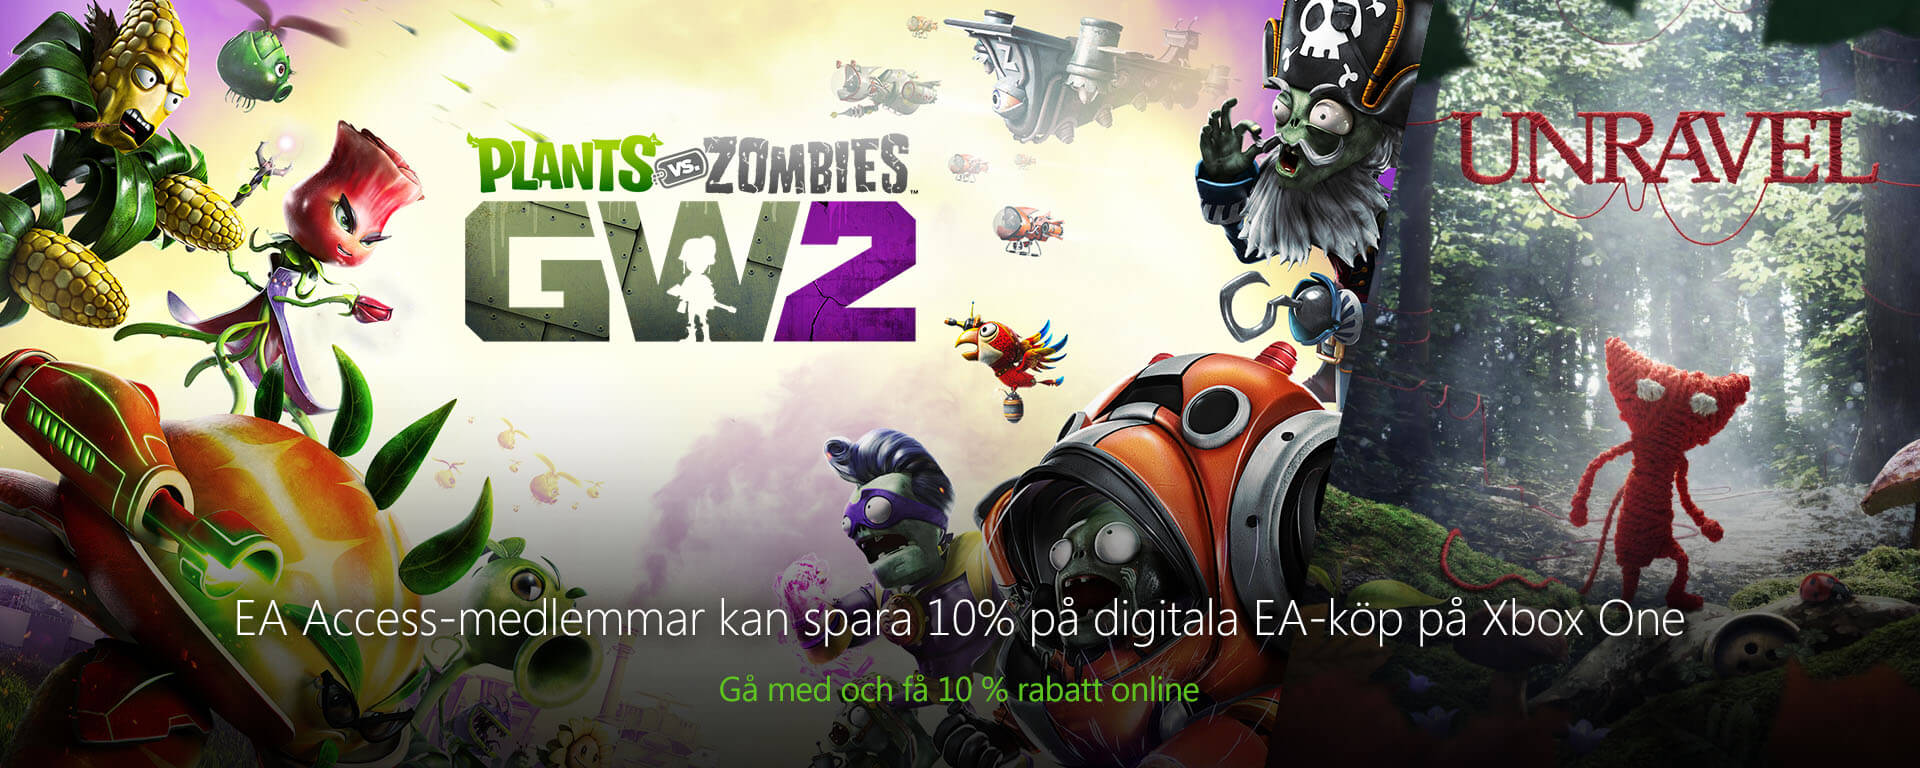 Plants vs Zombies: Garden Warfare 2 | Unravel | EA Access | Xbox One